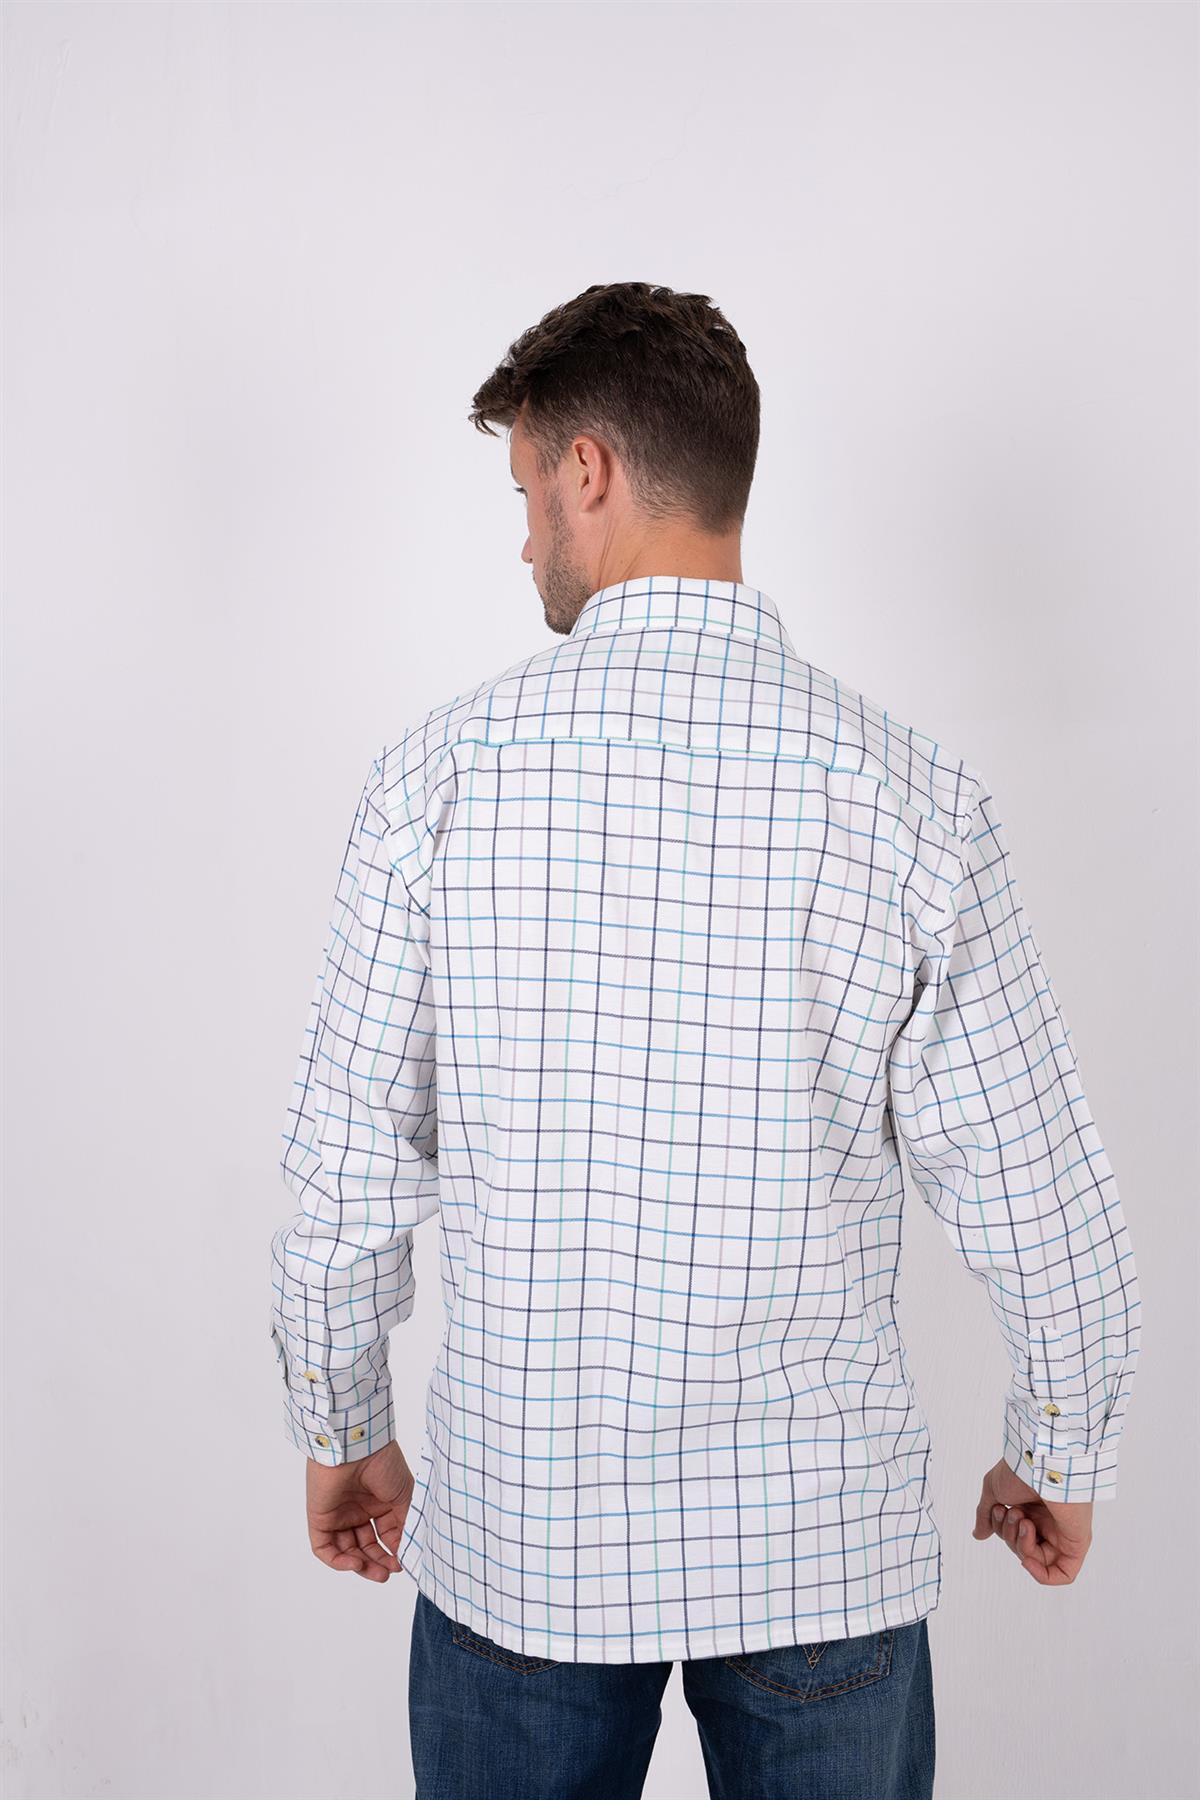 Country Classics Mens Long Sleeved Quality Country Check Shirt Blenheim £17.99